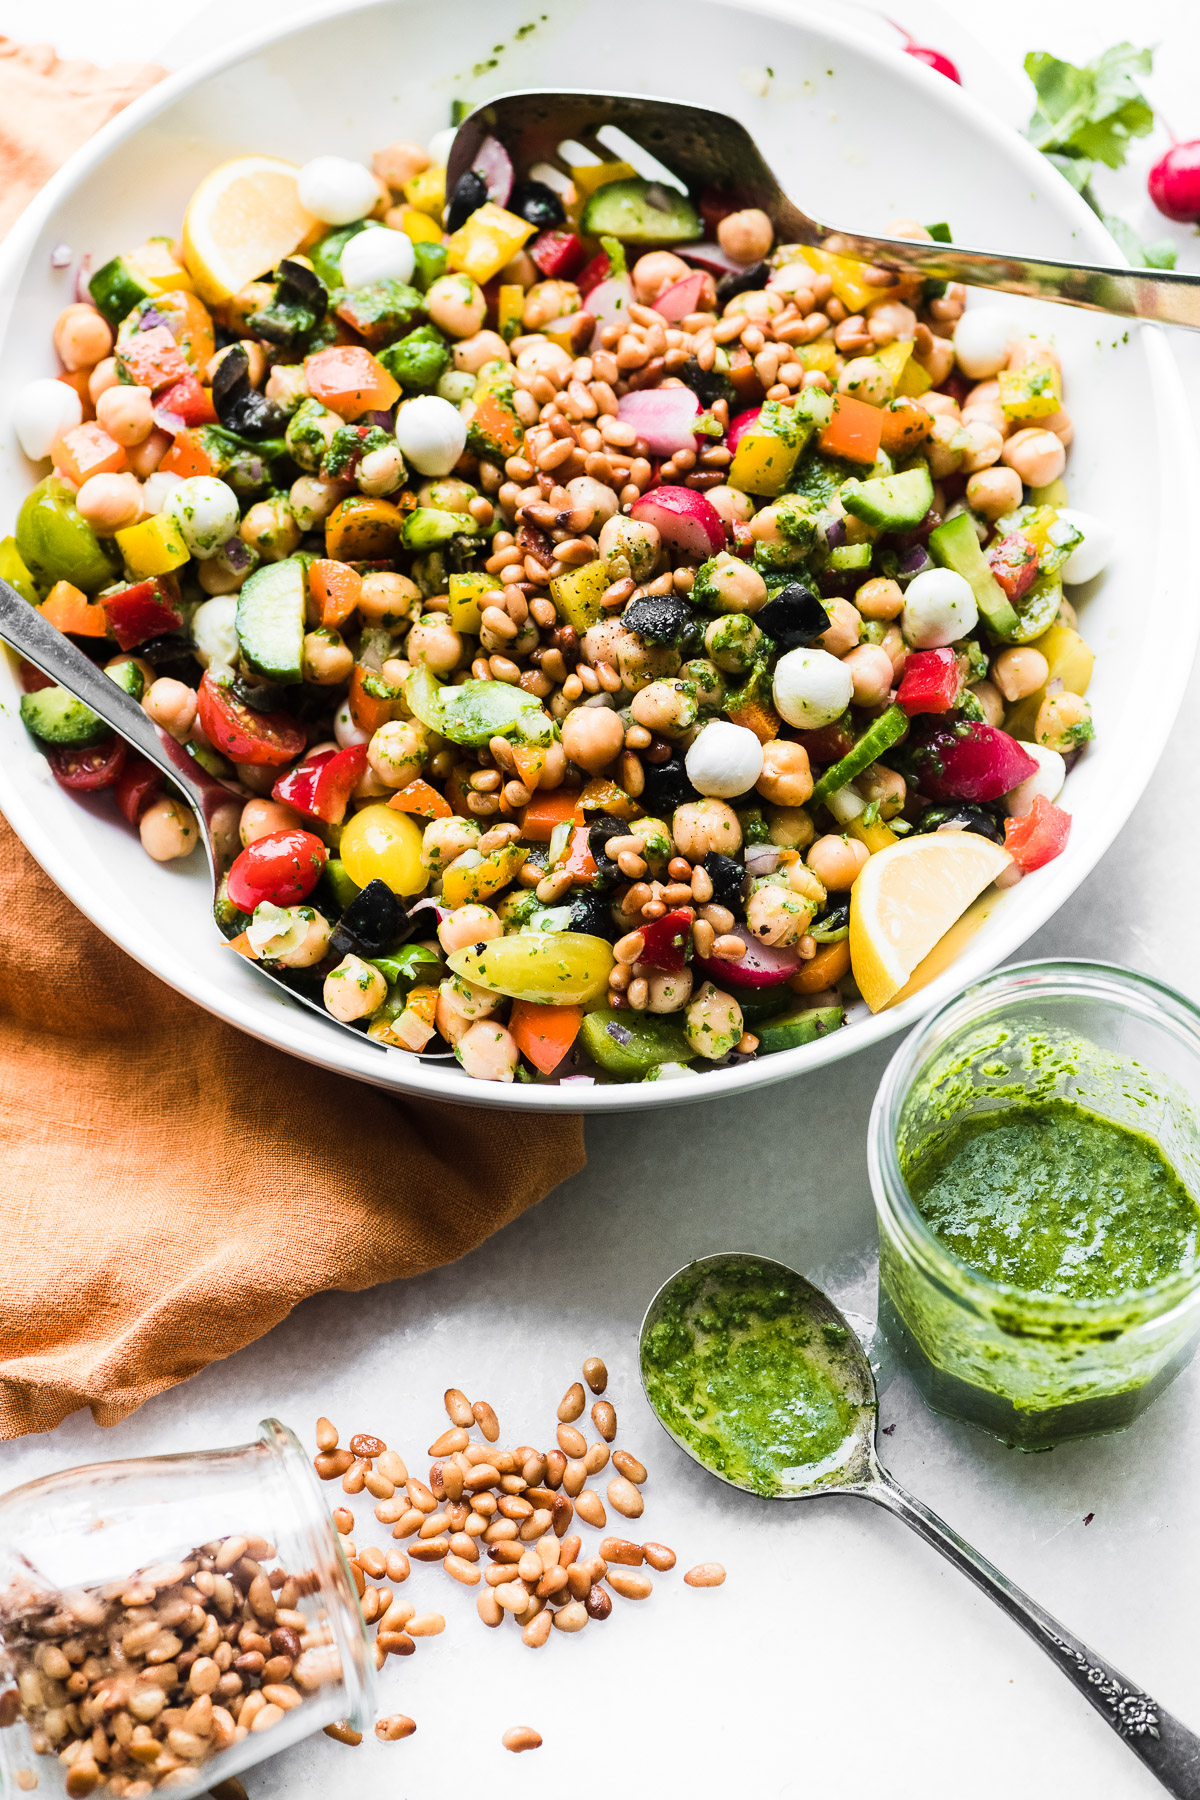 Mediterranean-chickpea-salad-8500561-January-28-2019.jpg